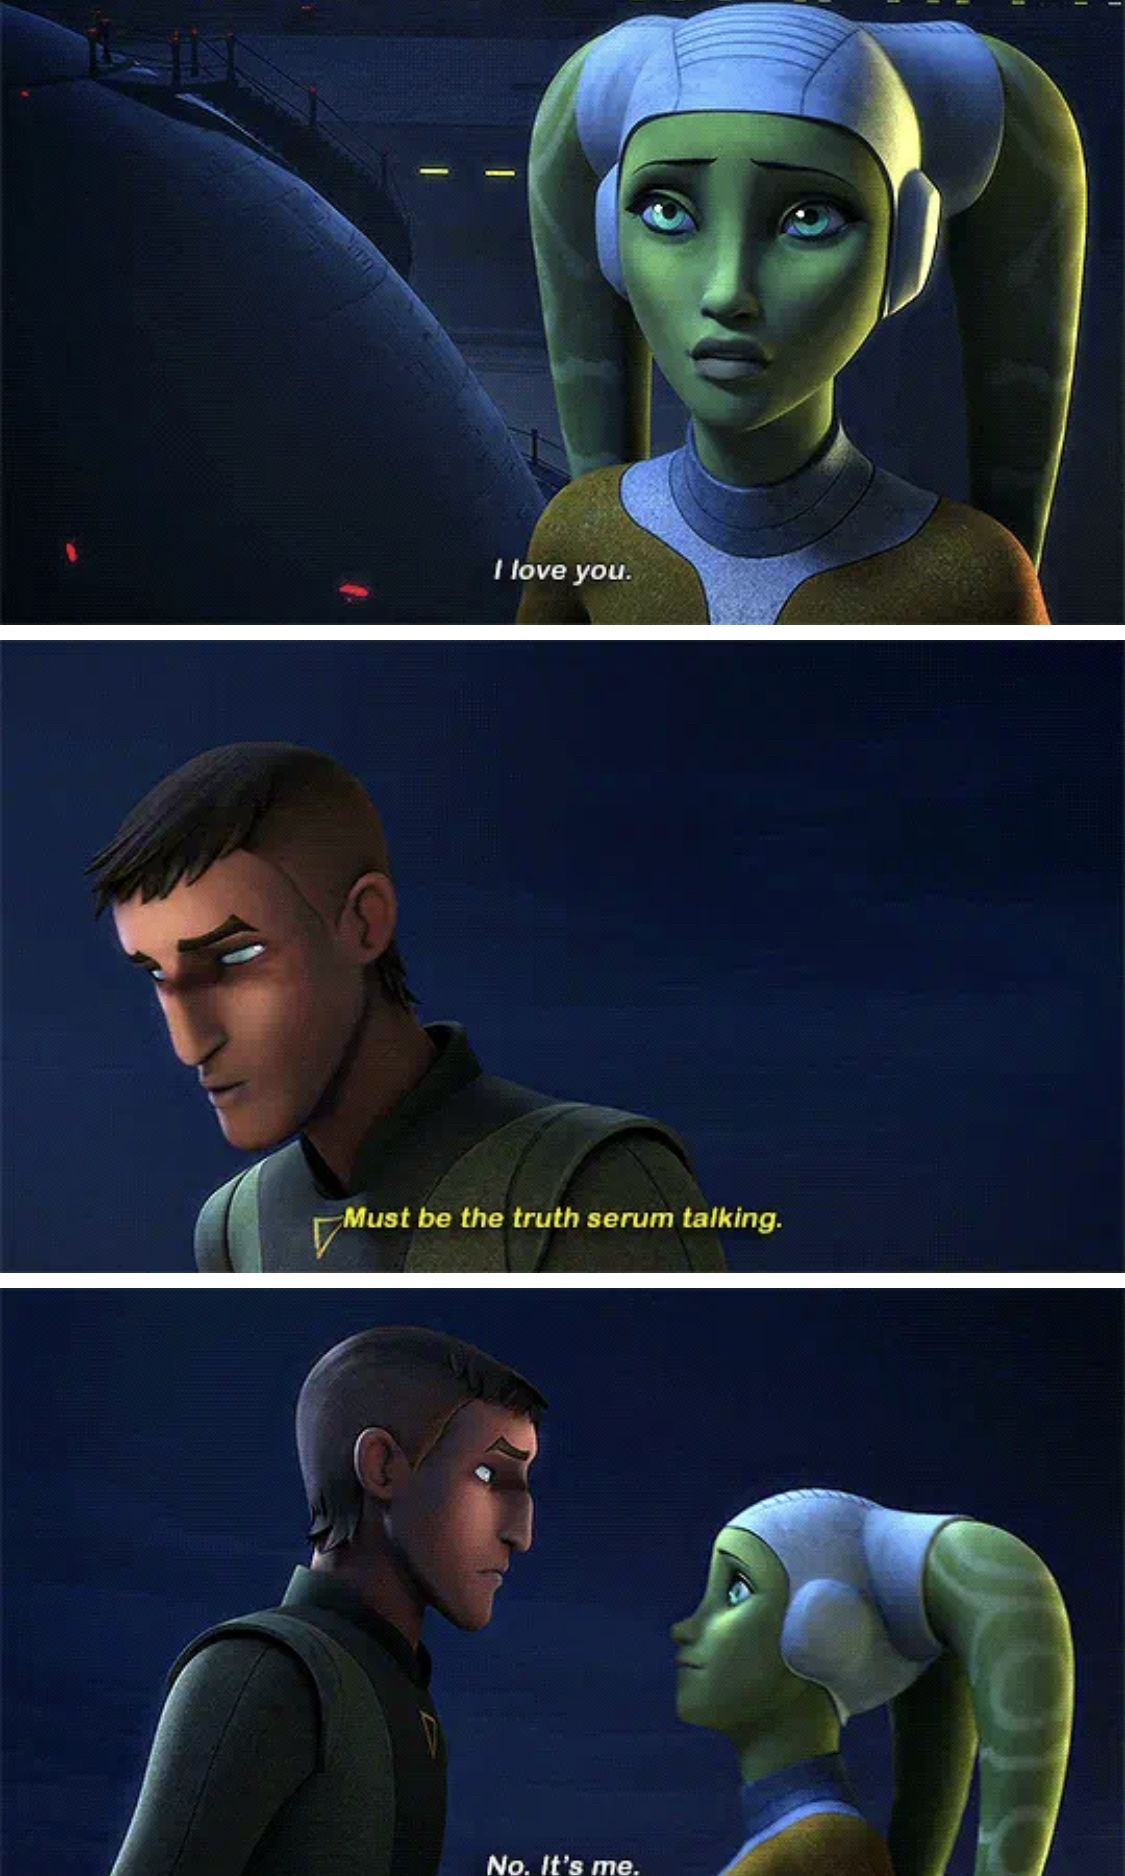 Pin By Alice Toren On Star Wars Star Wars Memes Star Wars Humor Star Wars Rebels